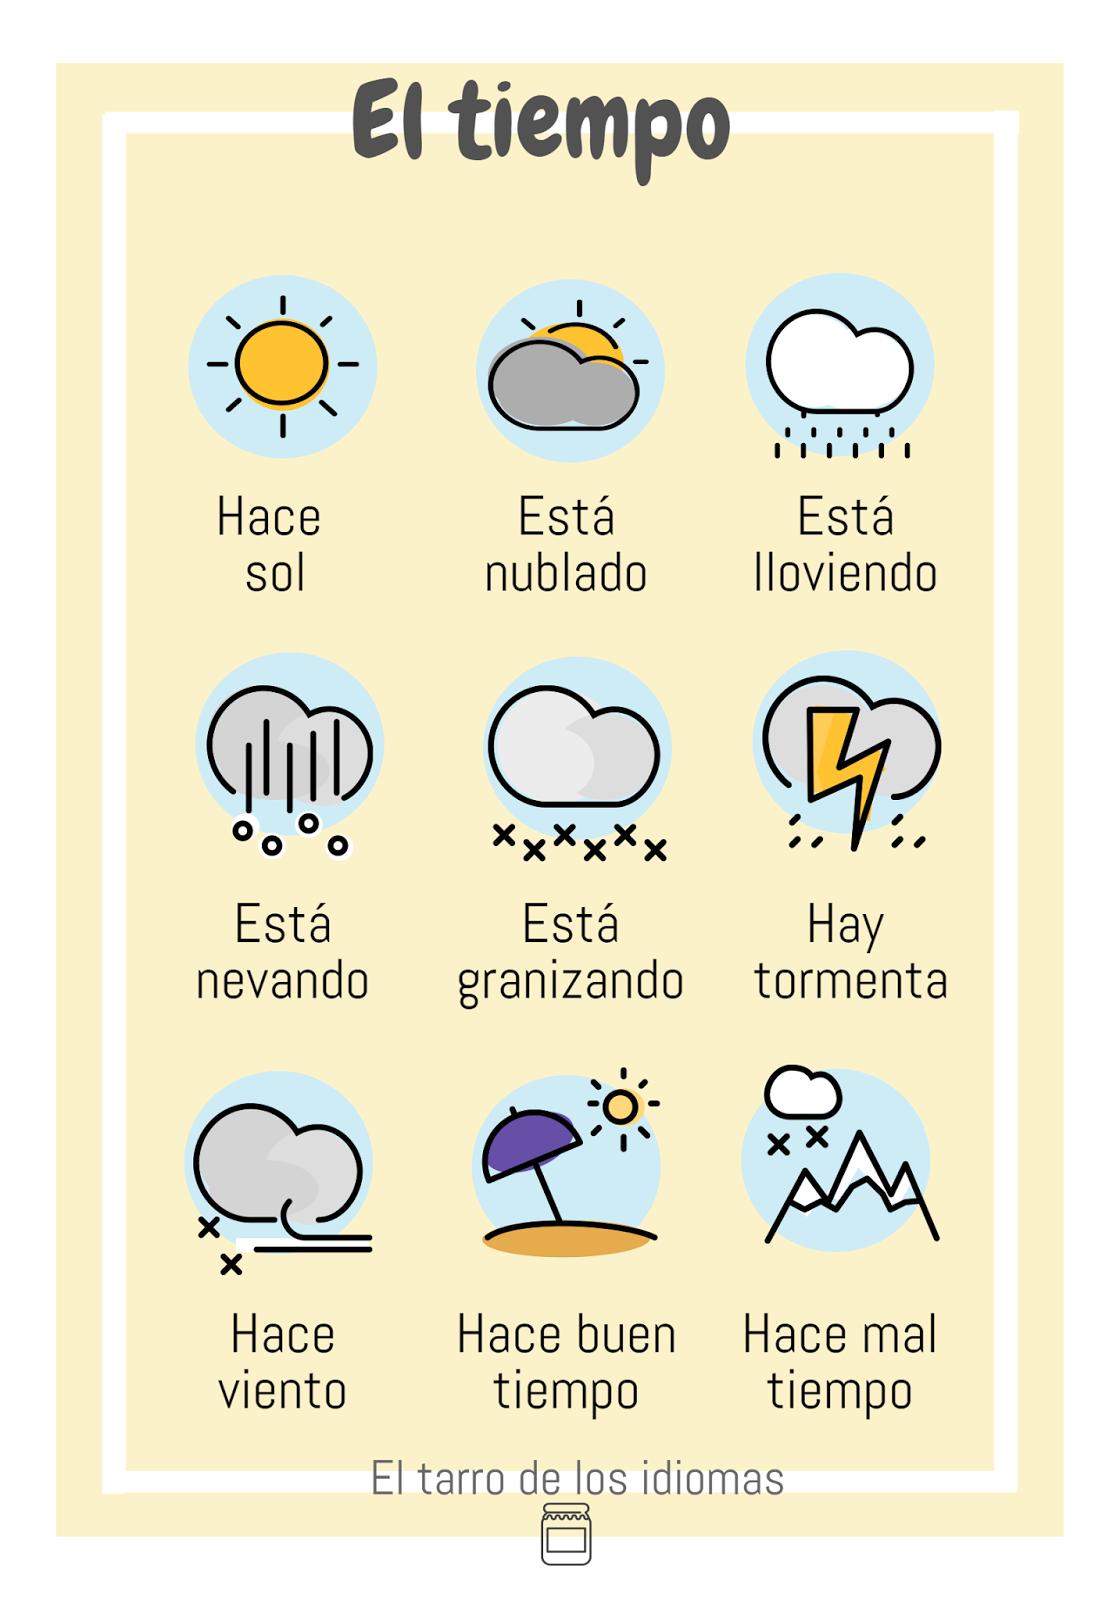 Ideas Y Recursos Para Profesores De Idiomas Actualmente Soy Profesora De Ele Pero Soy Titulada